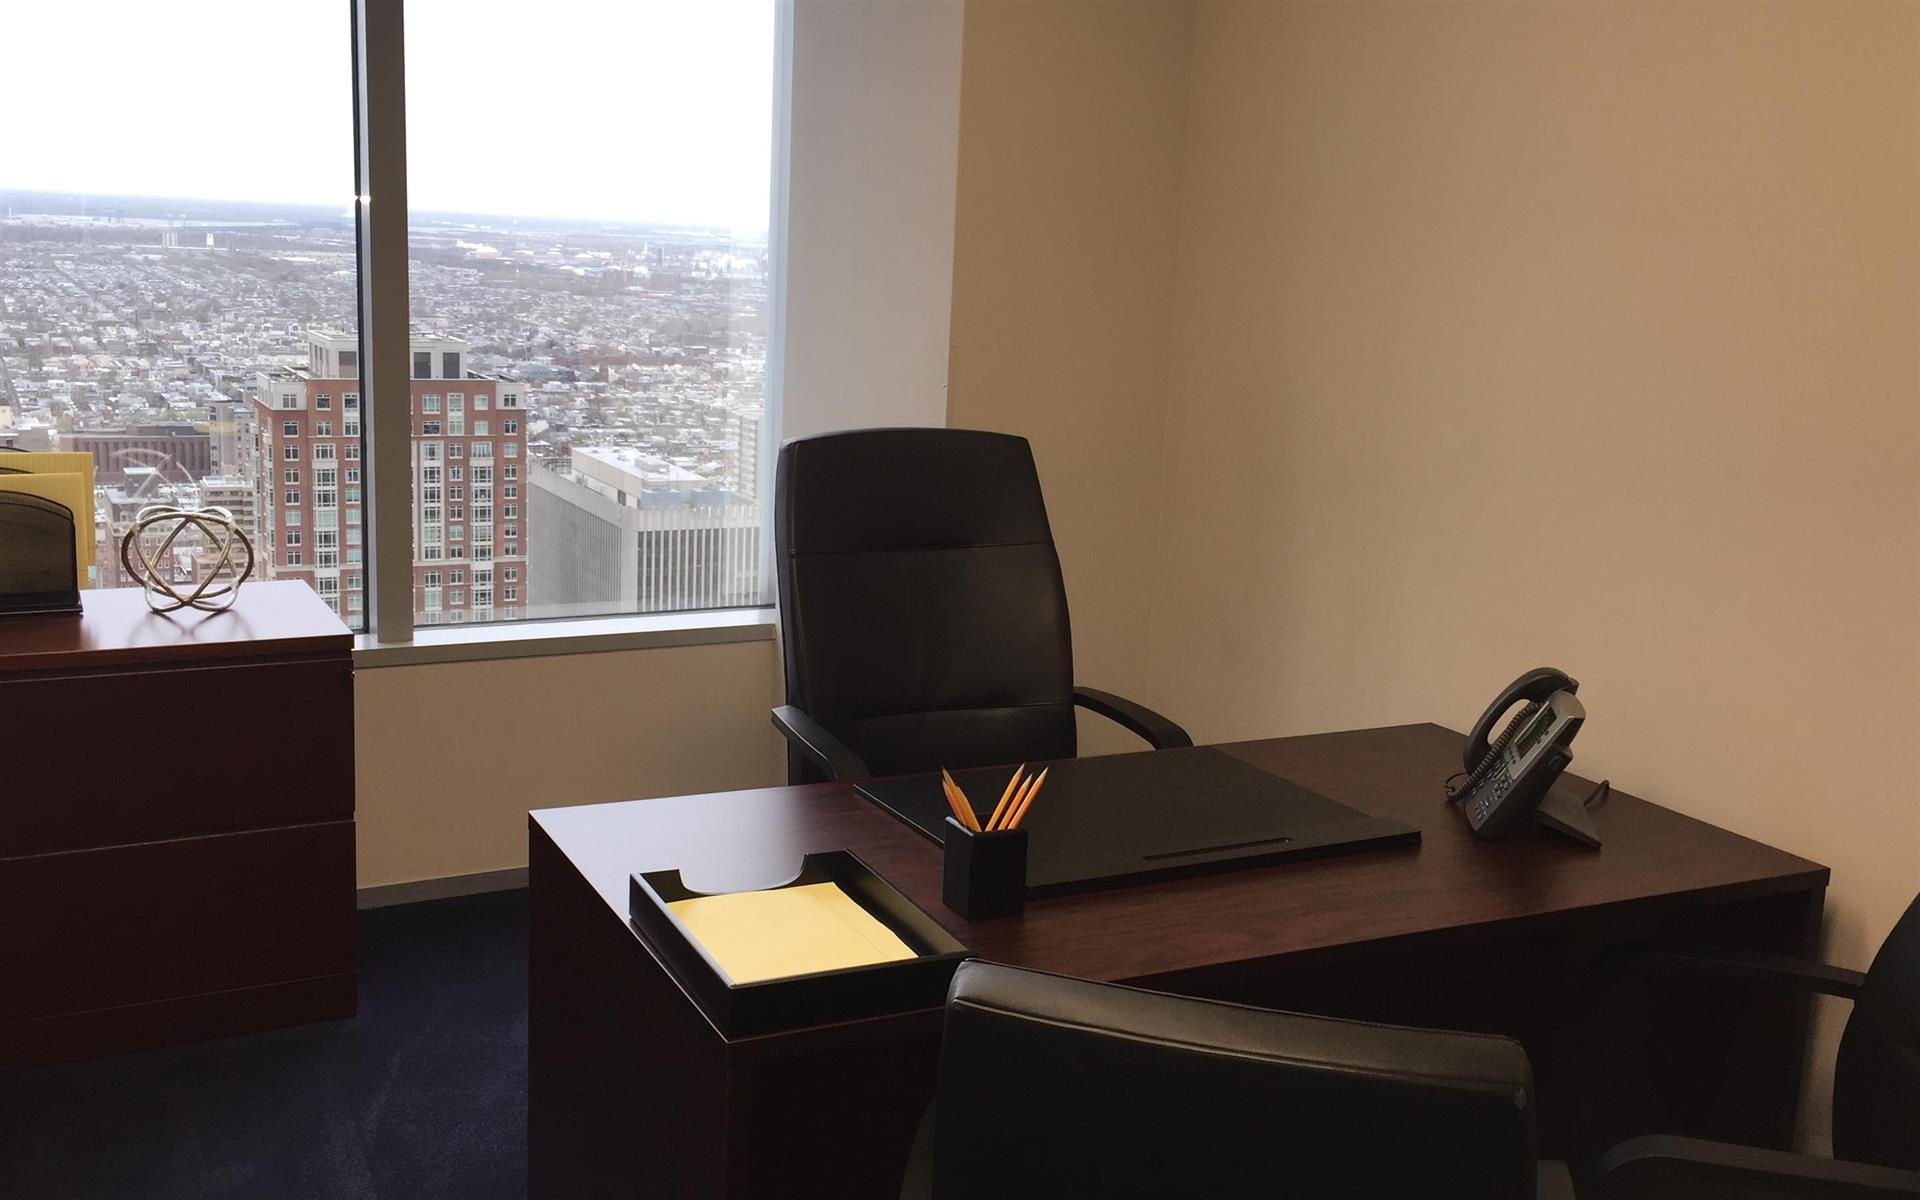 Servcorp - Philadelphia BNY Mellon Center - 2 Adjacent Private Offices